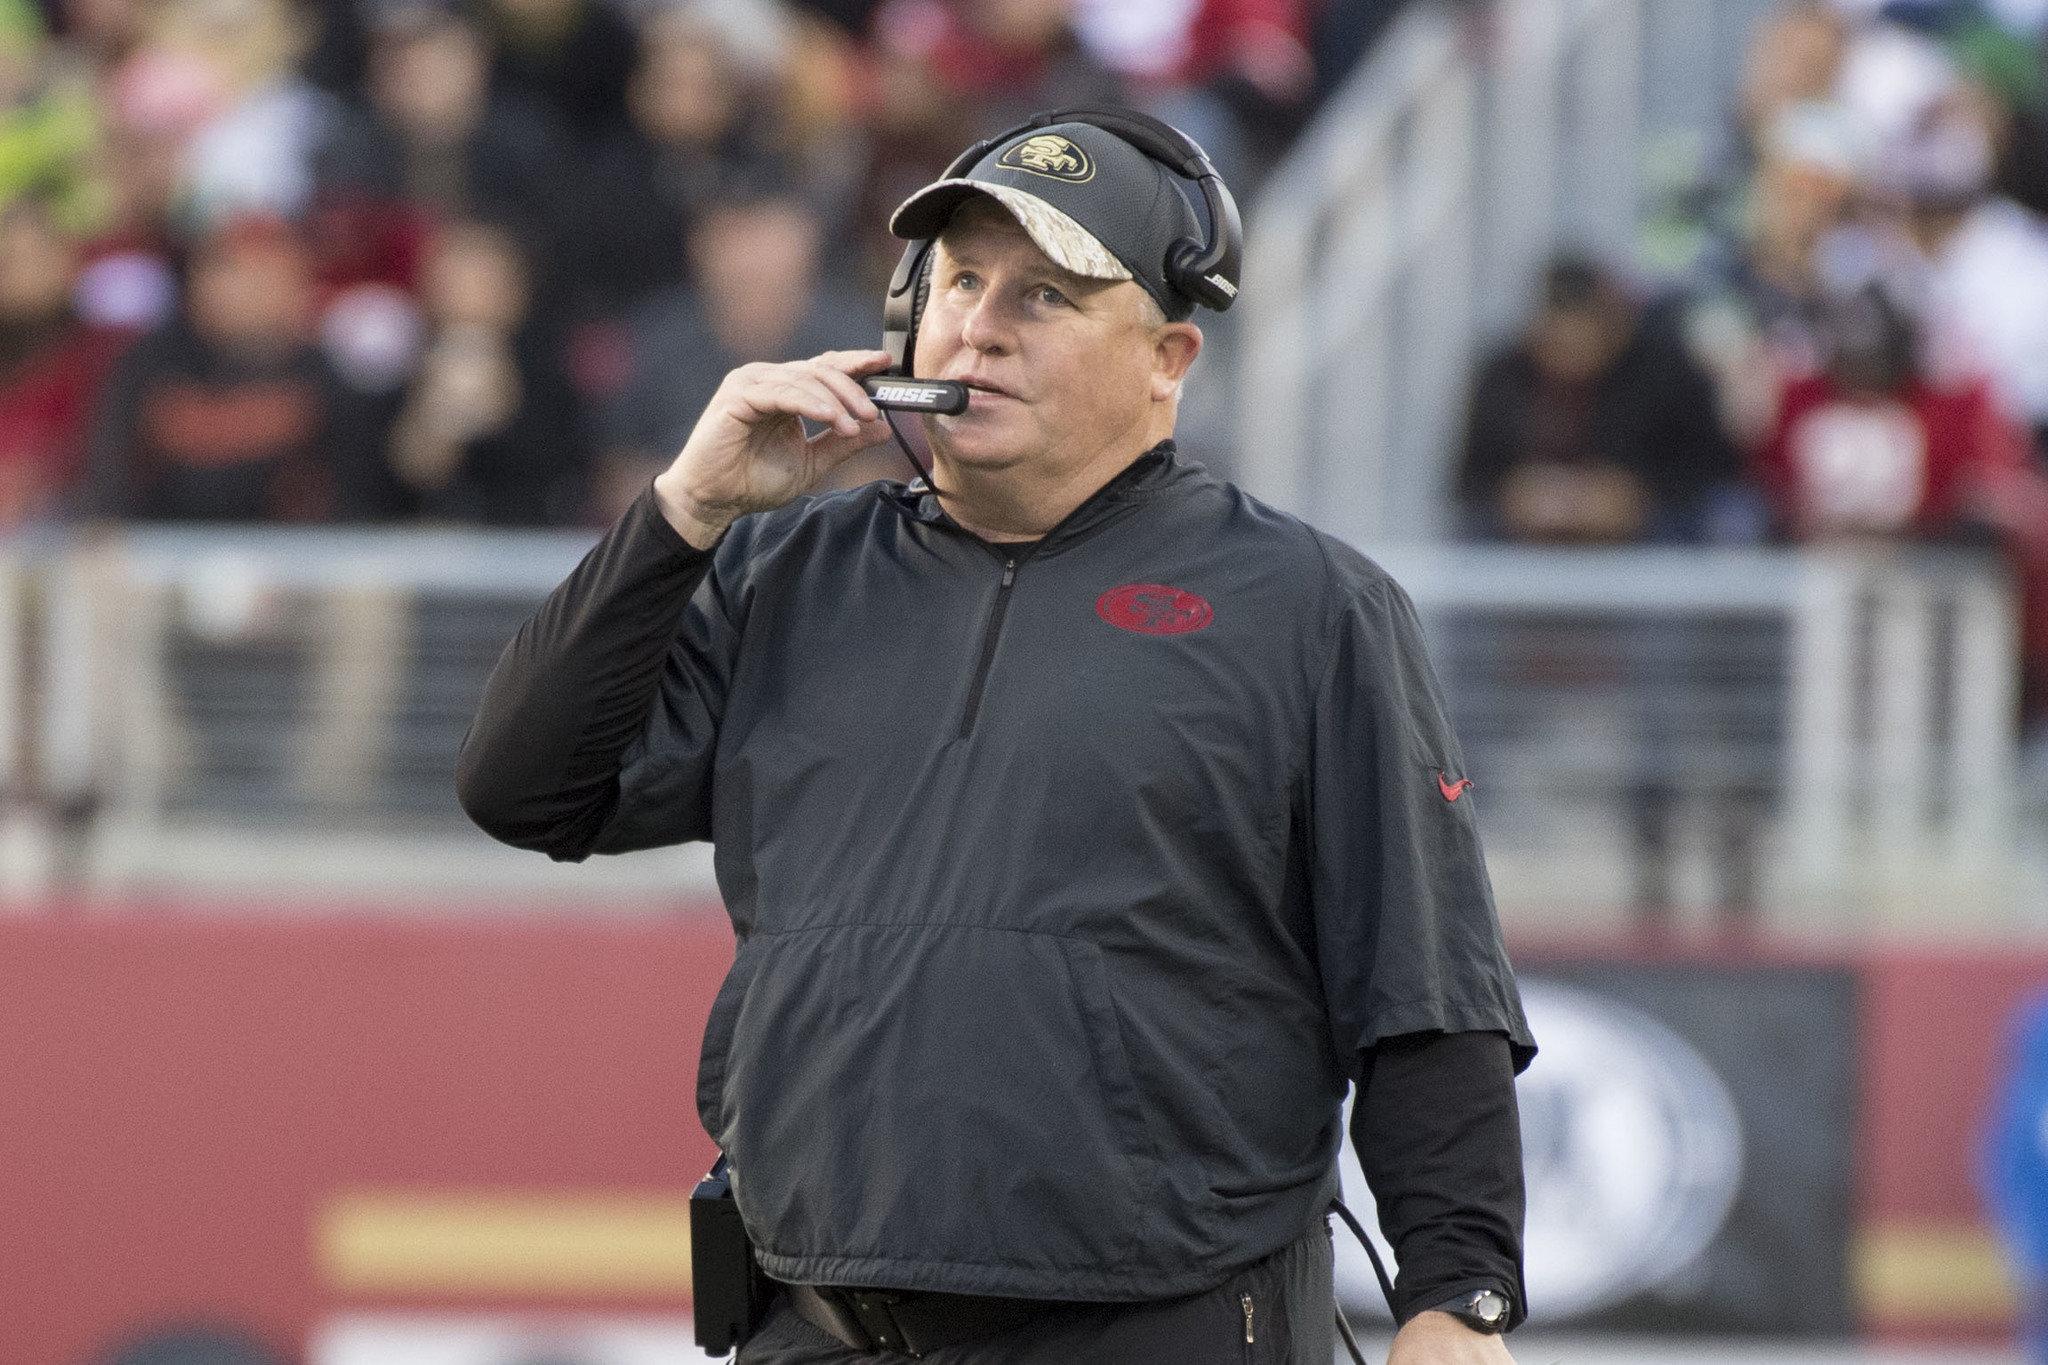 Ex eagles de trent cole blasts former 49ers coach chip kelly nj voltagebd Choice Image